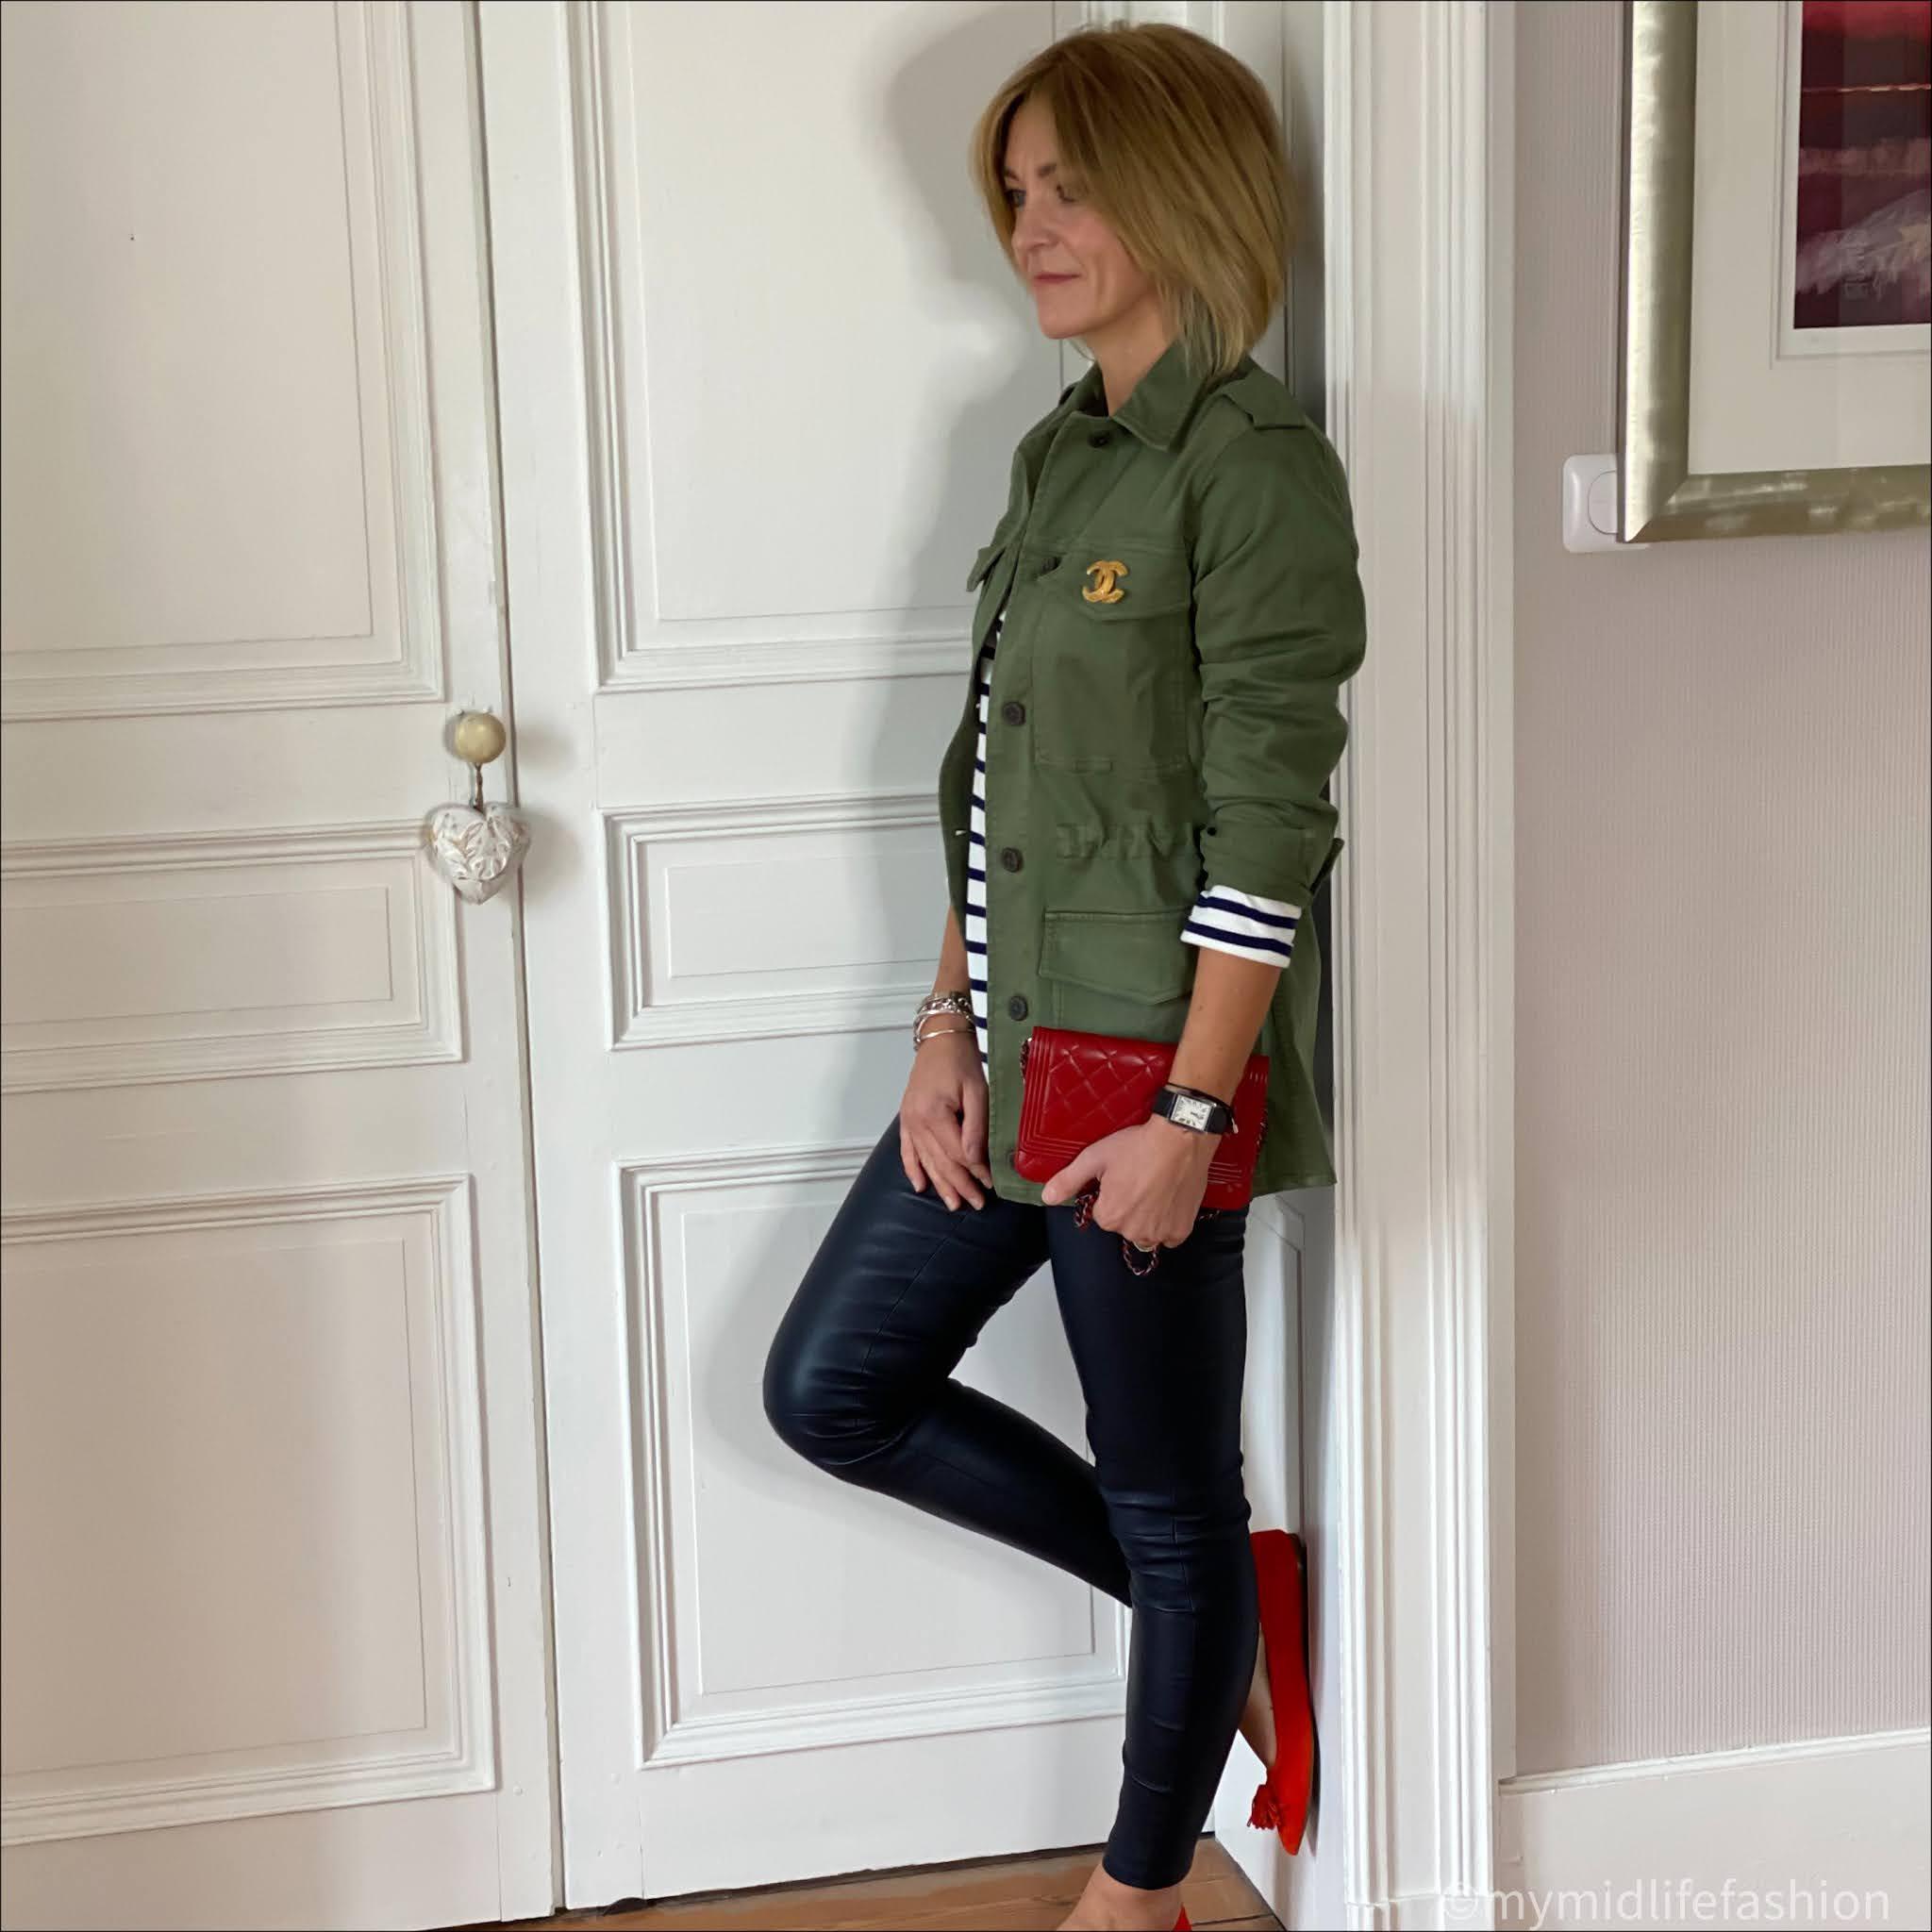 my midlife fashion, Chanel brooch, baukjen Layla organic top, baukjen drake organic utility jacket, uterque leather leggings, Chanel wallet on chain, j crew pointed tassel flat pumps